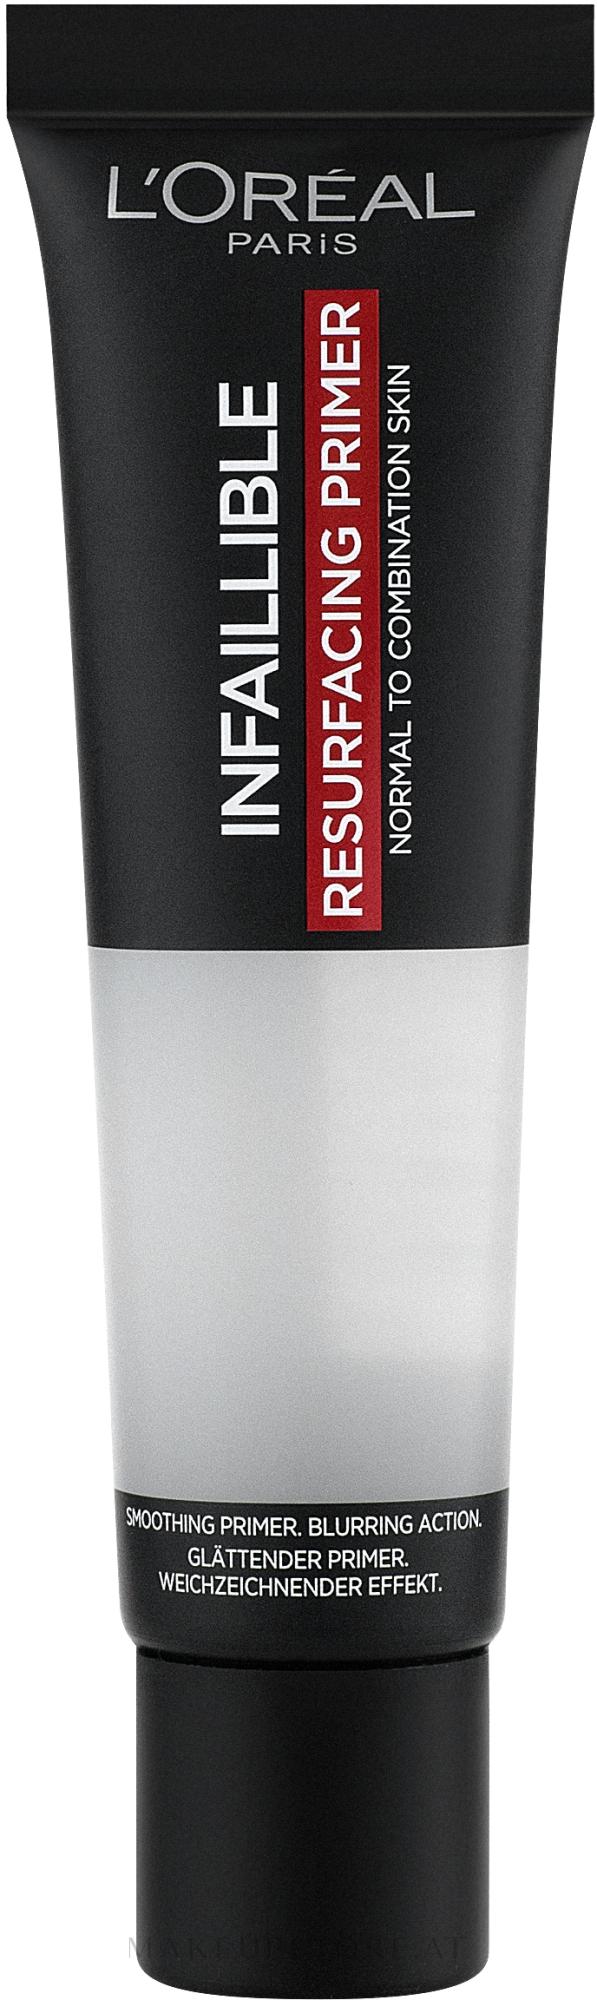 Make-up Base - L'Oreal Paris Infaillible Primer Base — Bild Transparent